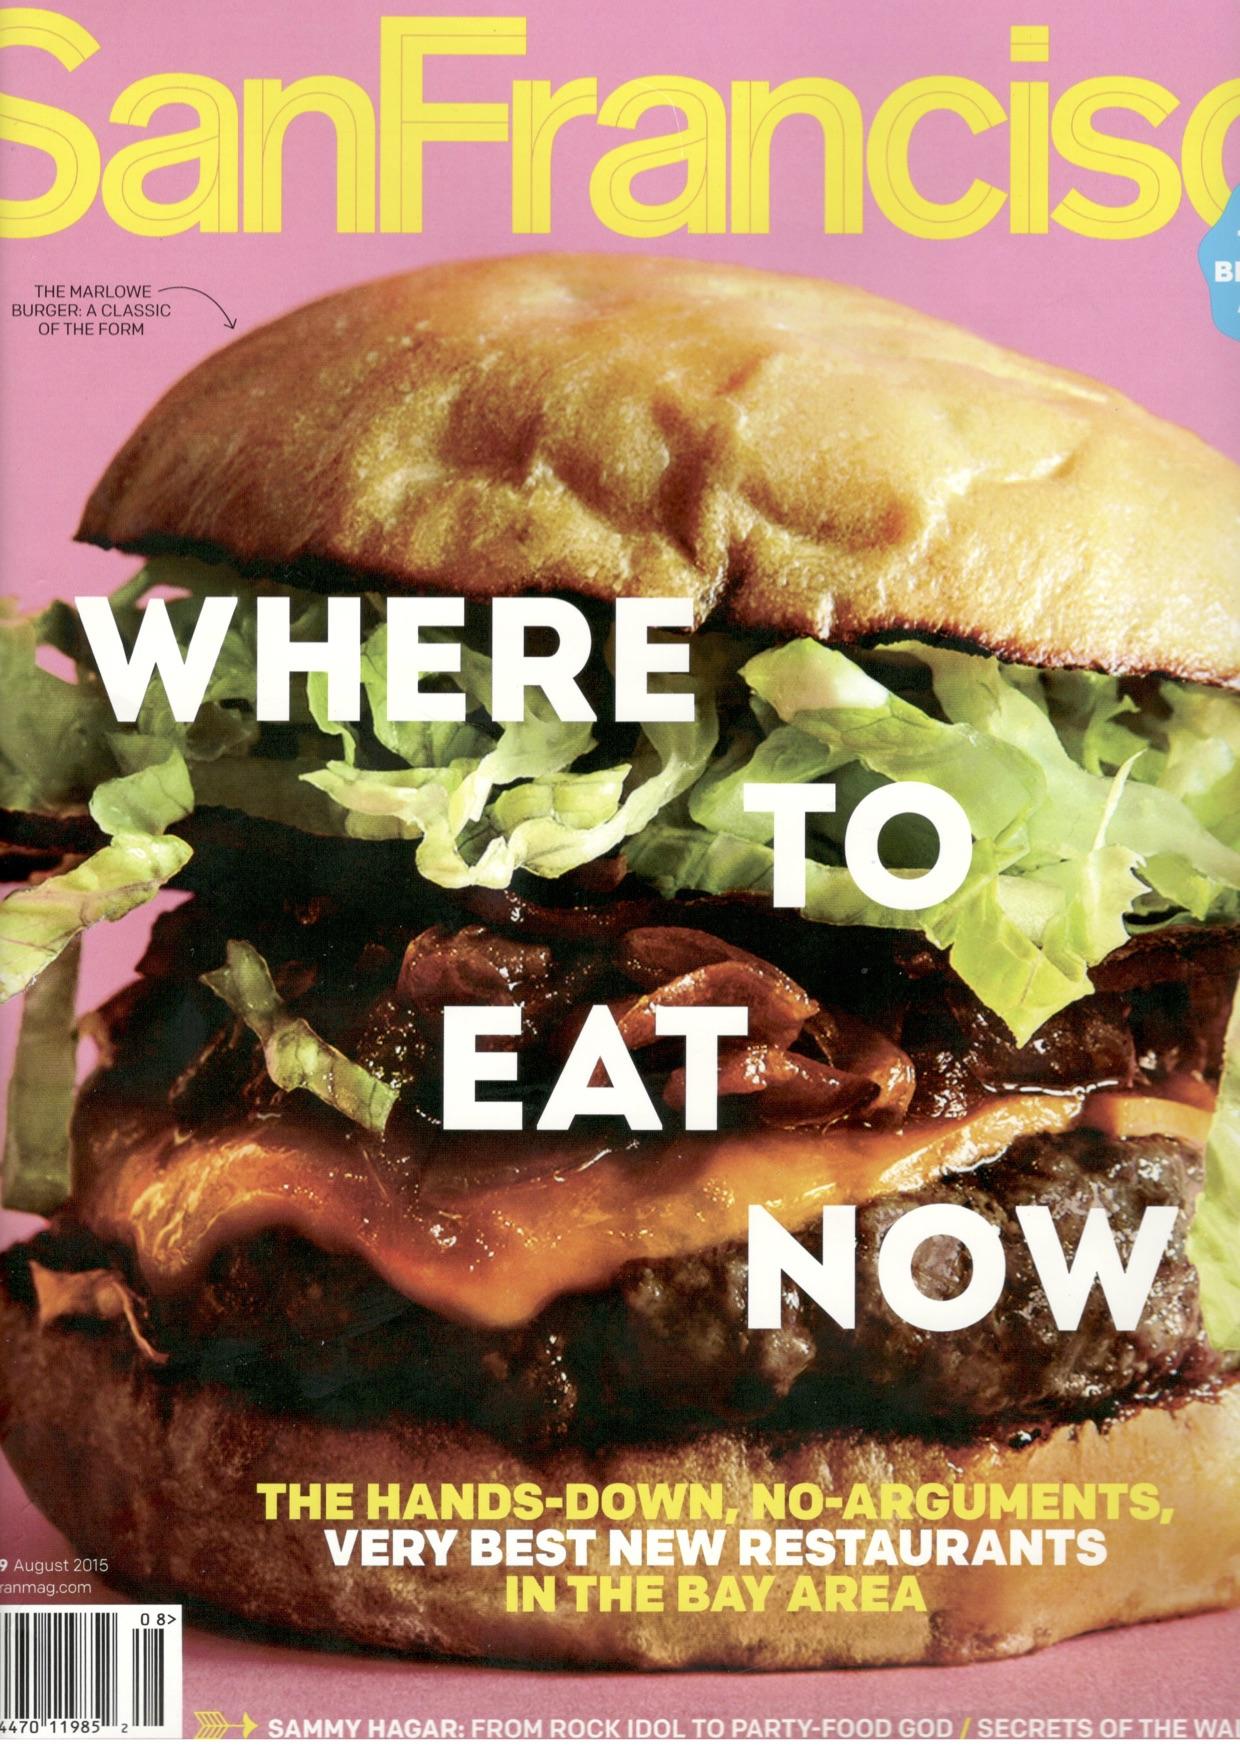 Marlowe - Burger on cover of SF Magazine August 2015.jpg